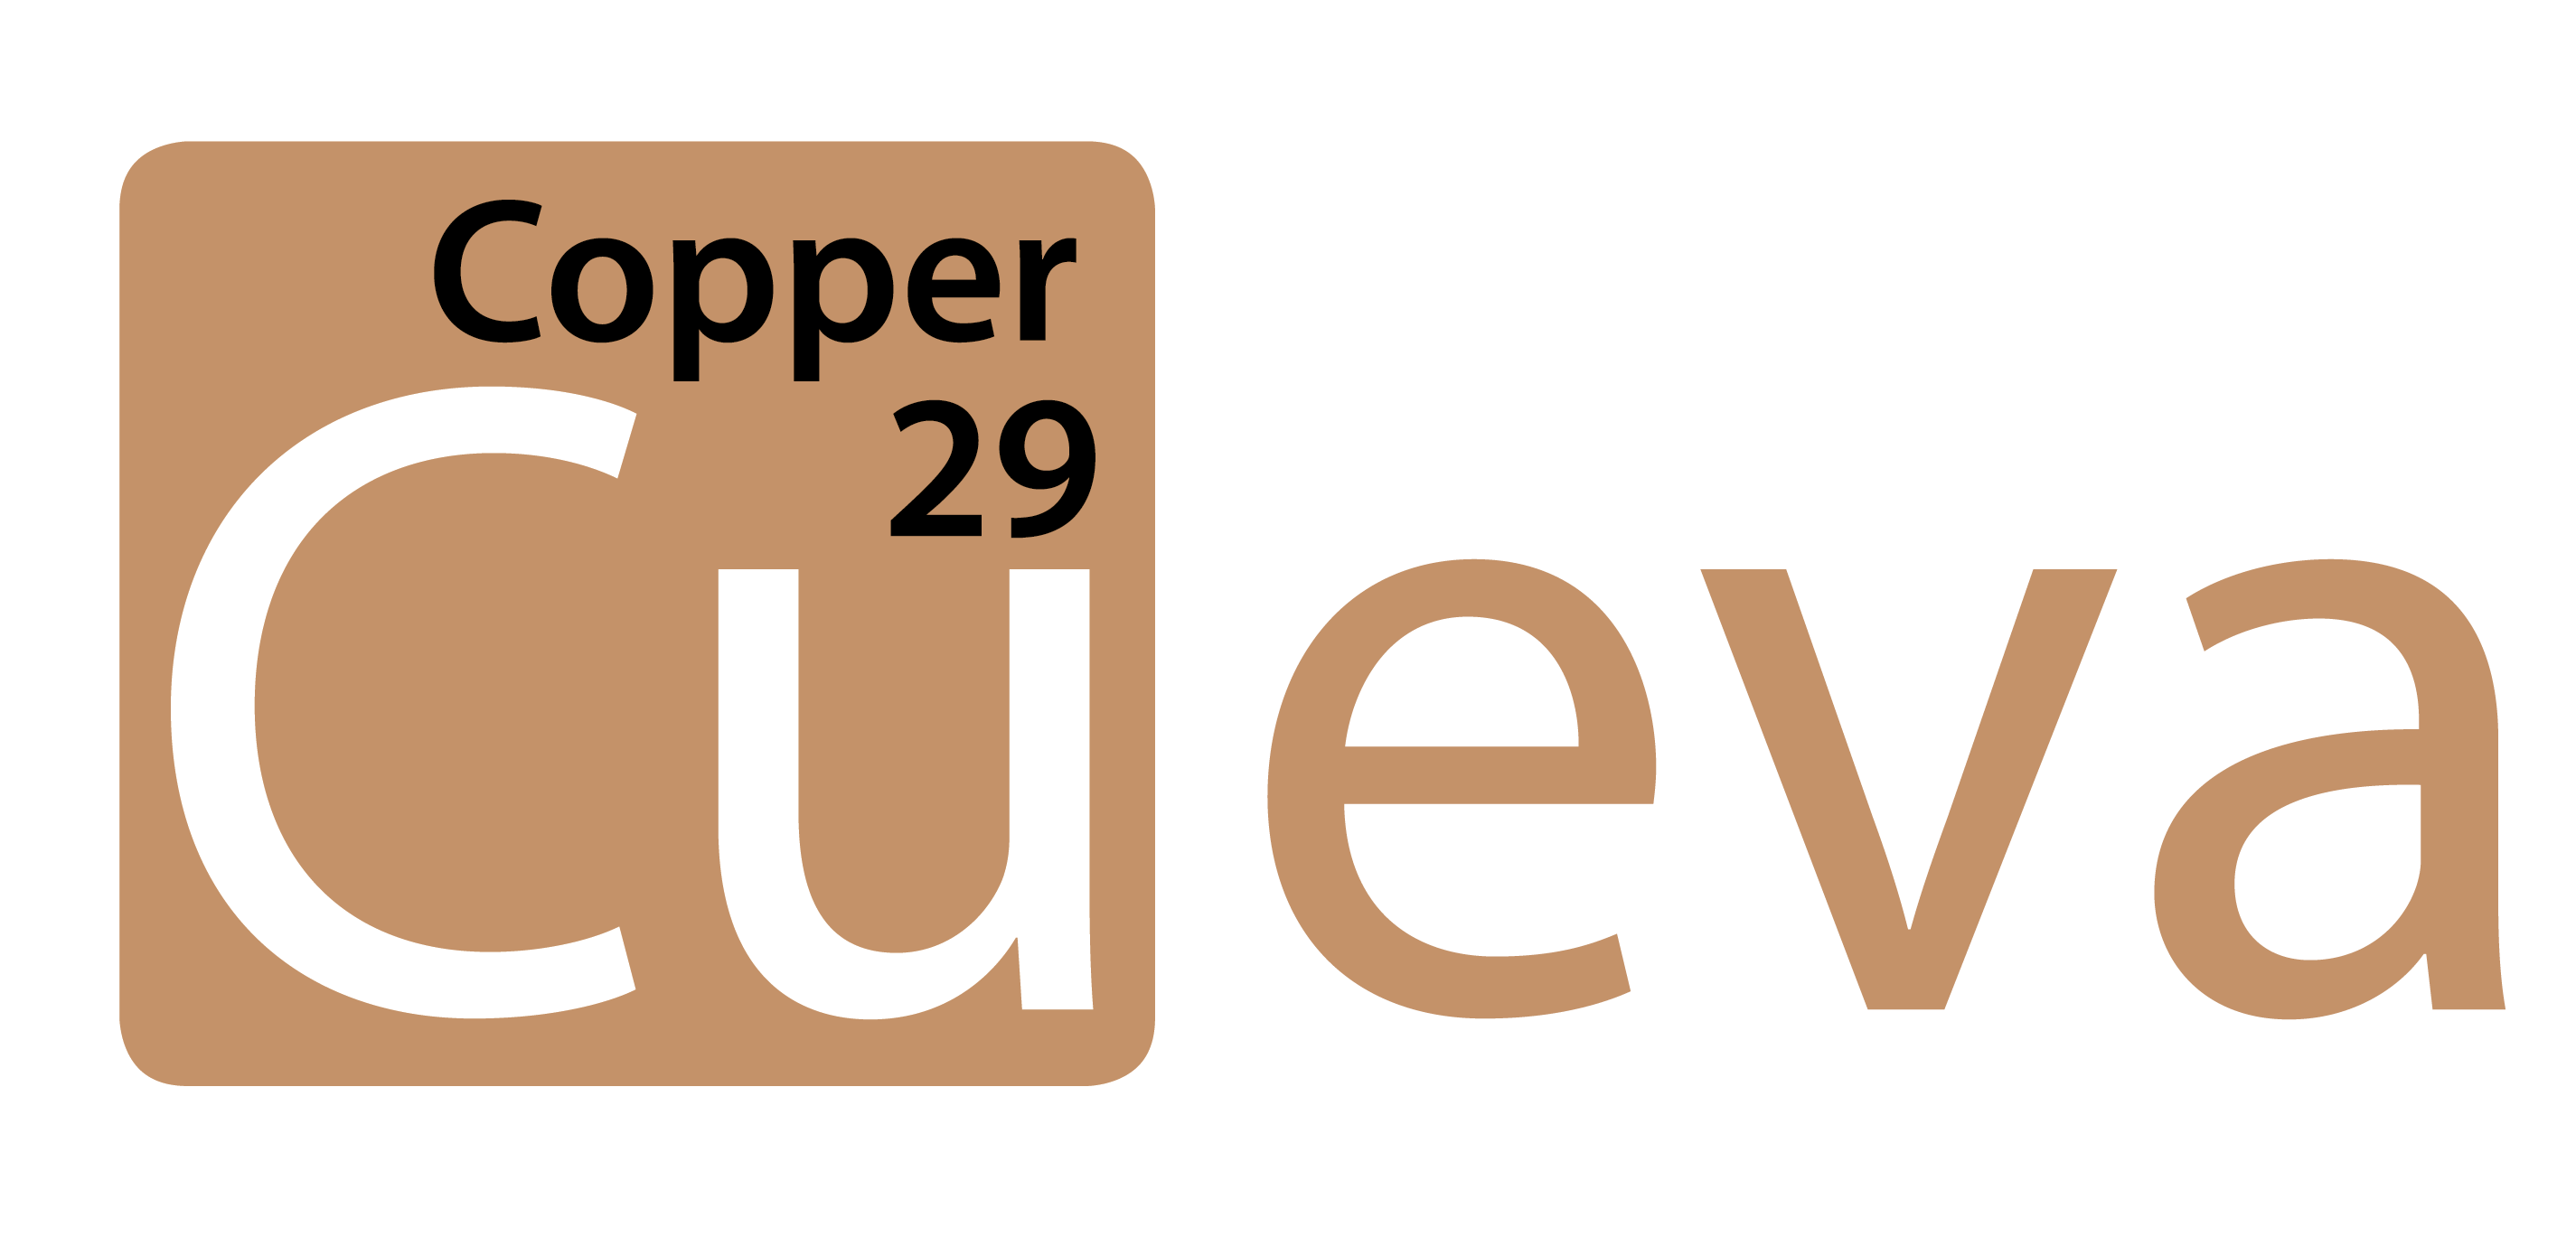 Cueva_tile_logo-01-1